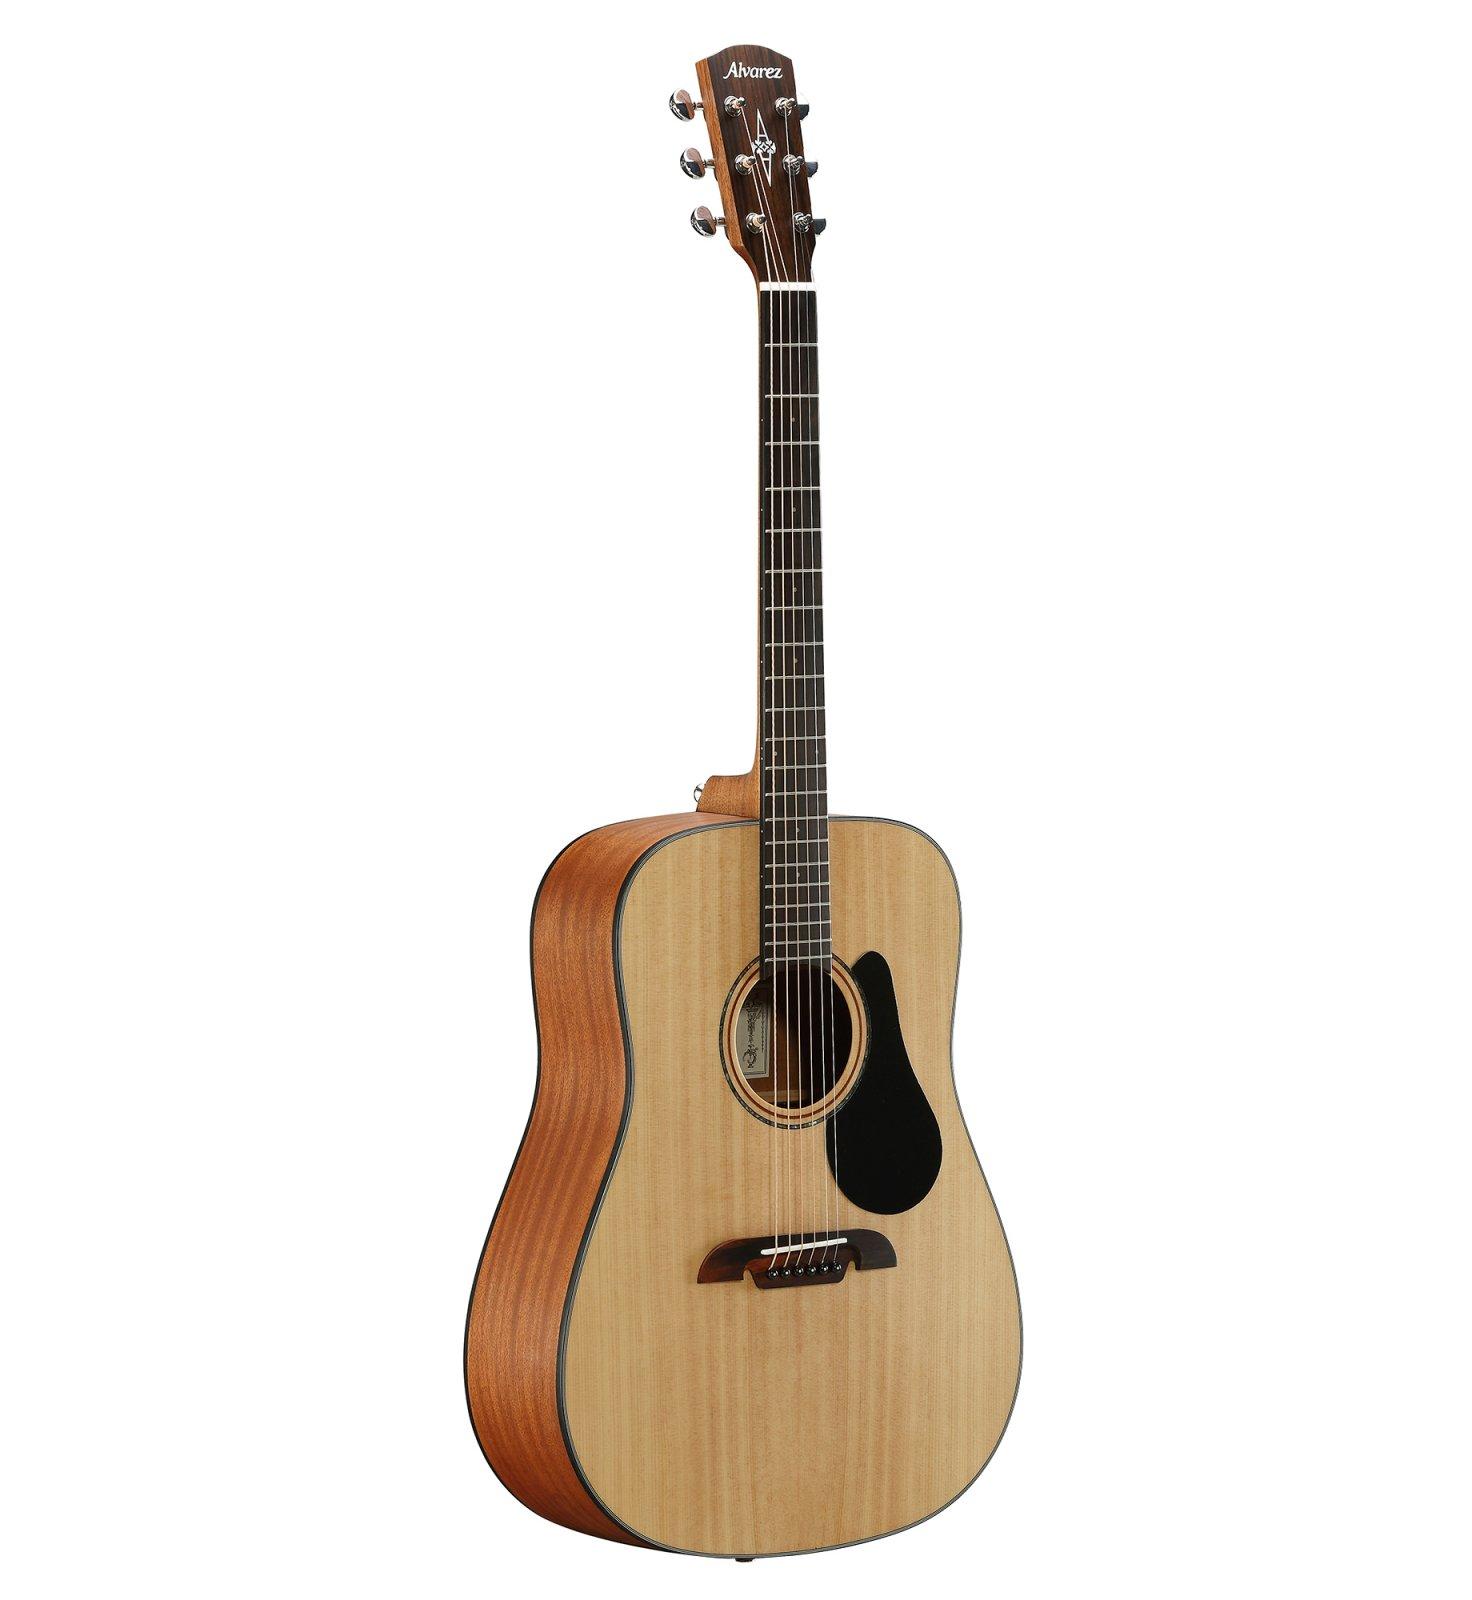 Alvarez AD30 Acoustic Guitar